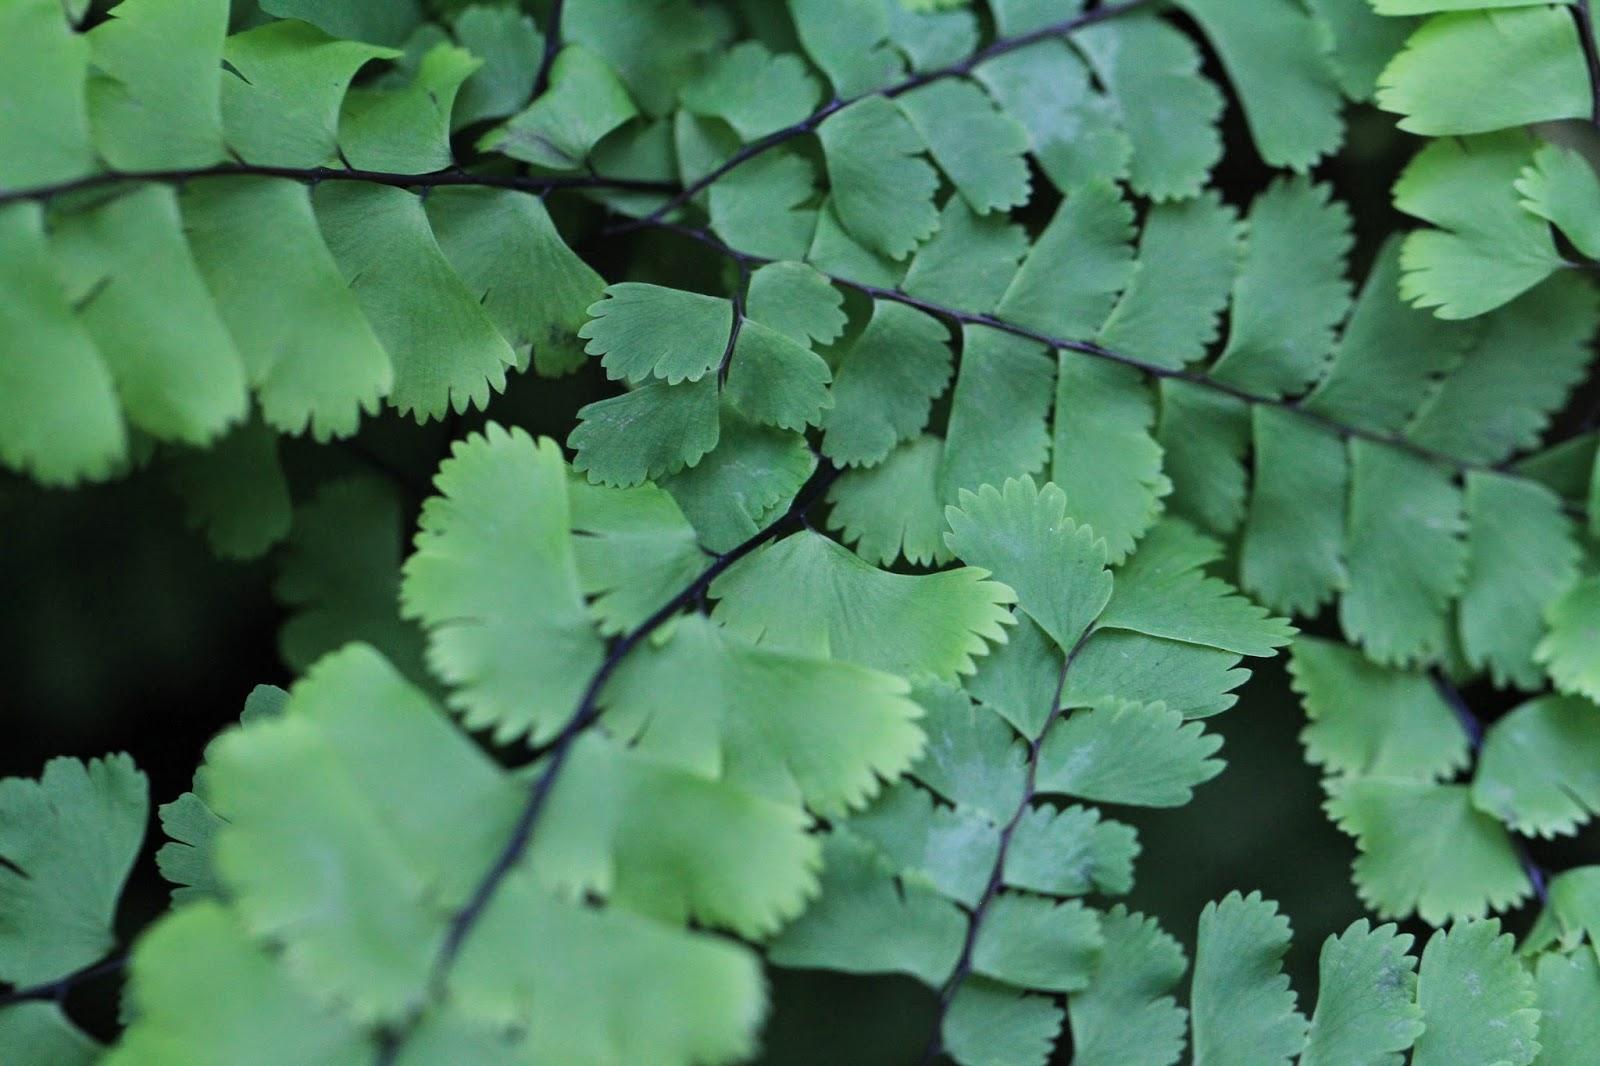 Adiantum aleuticum (Western Maidenhair Fern)